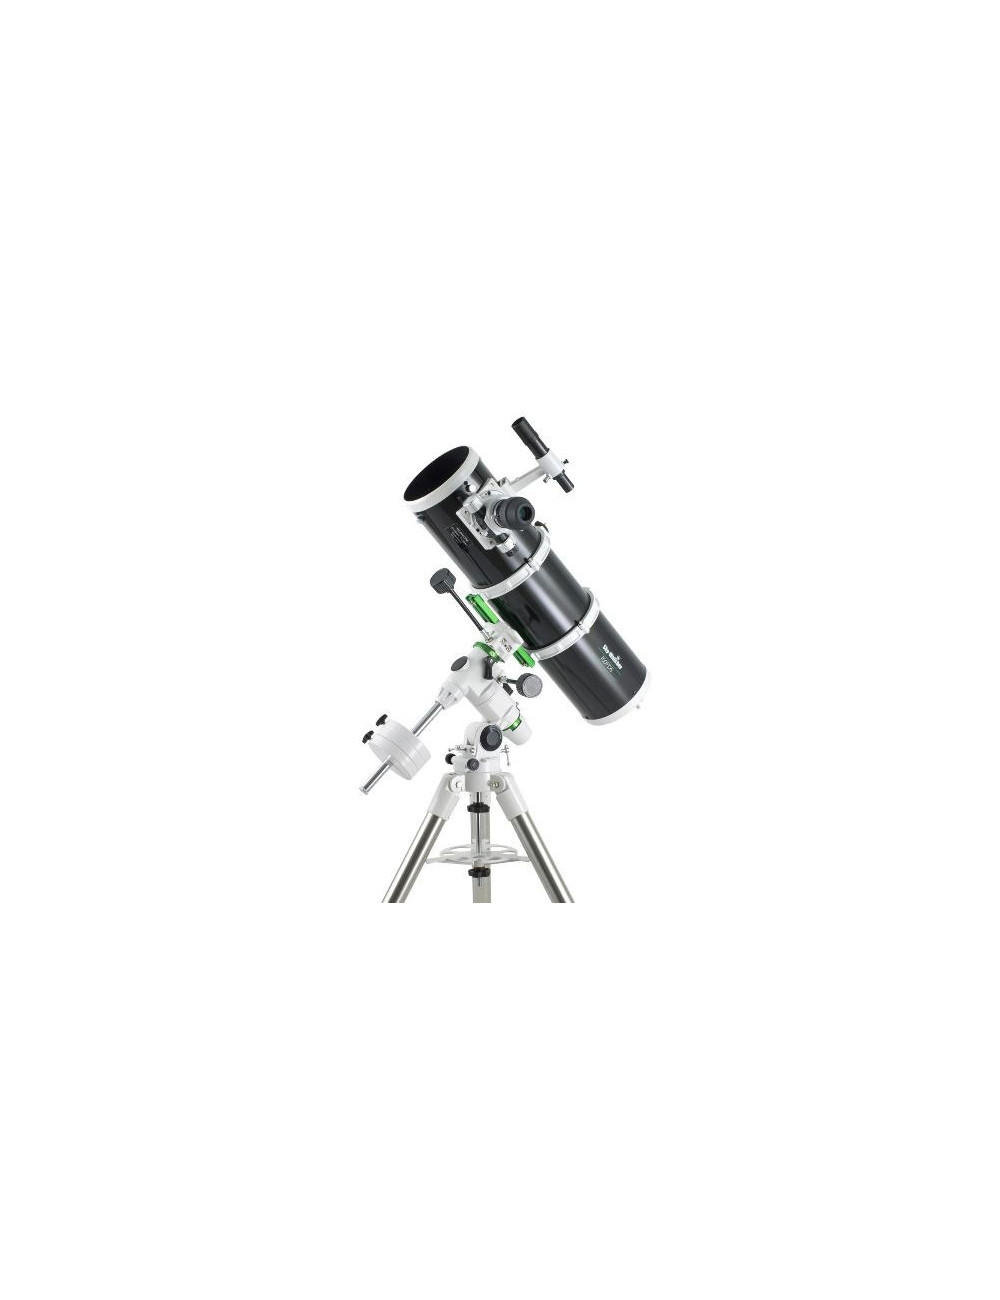 Télescope Sky-Watcher 150/750 Dual Speed sur NEQ3-2 Black Diamond